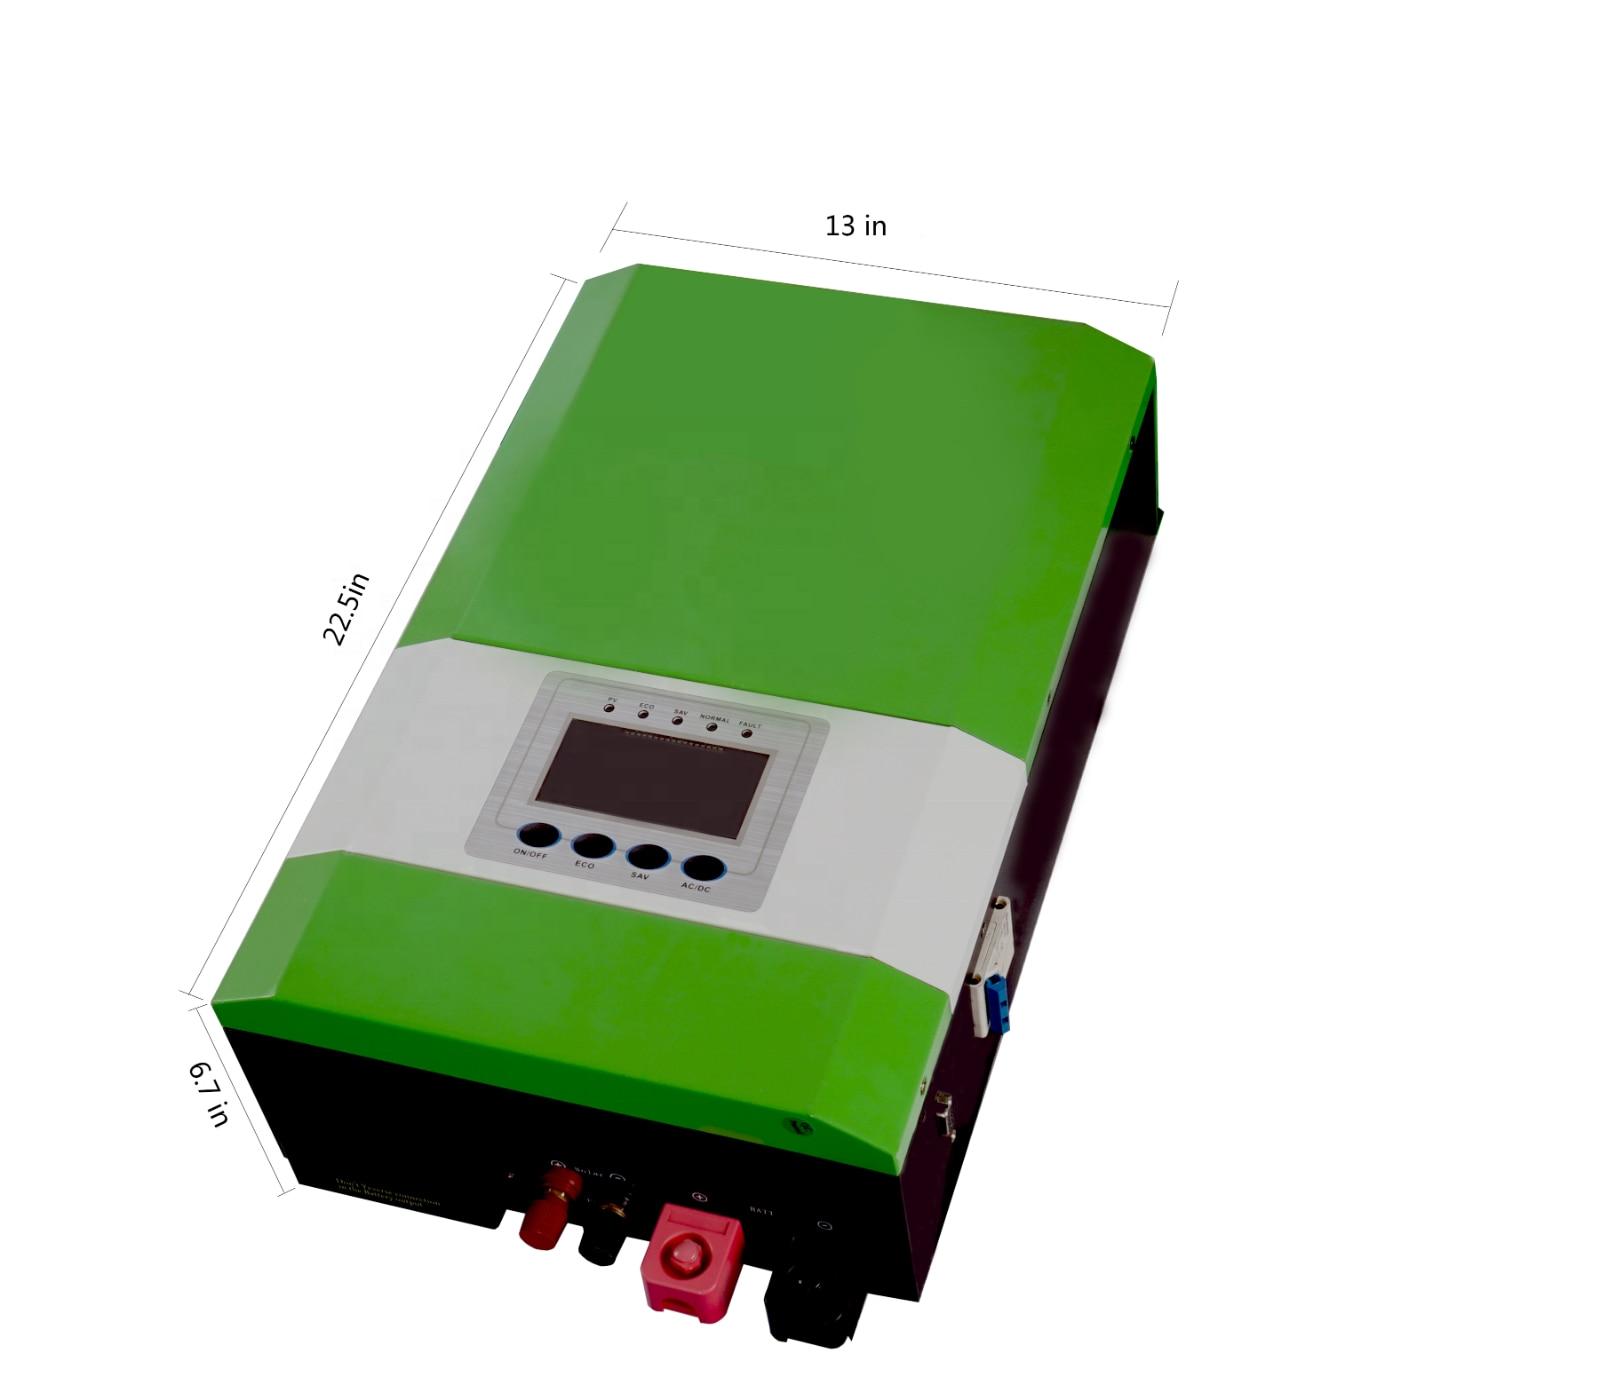 FLTXNY POWER 1000 واط 12/24 فولت خارج الشبكة MPPT الشمسية العاكس موجة جيبية نقية عاكس الطاقة 1KW